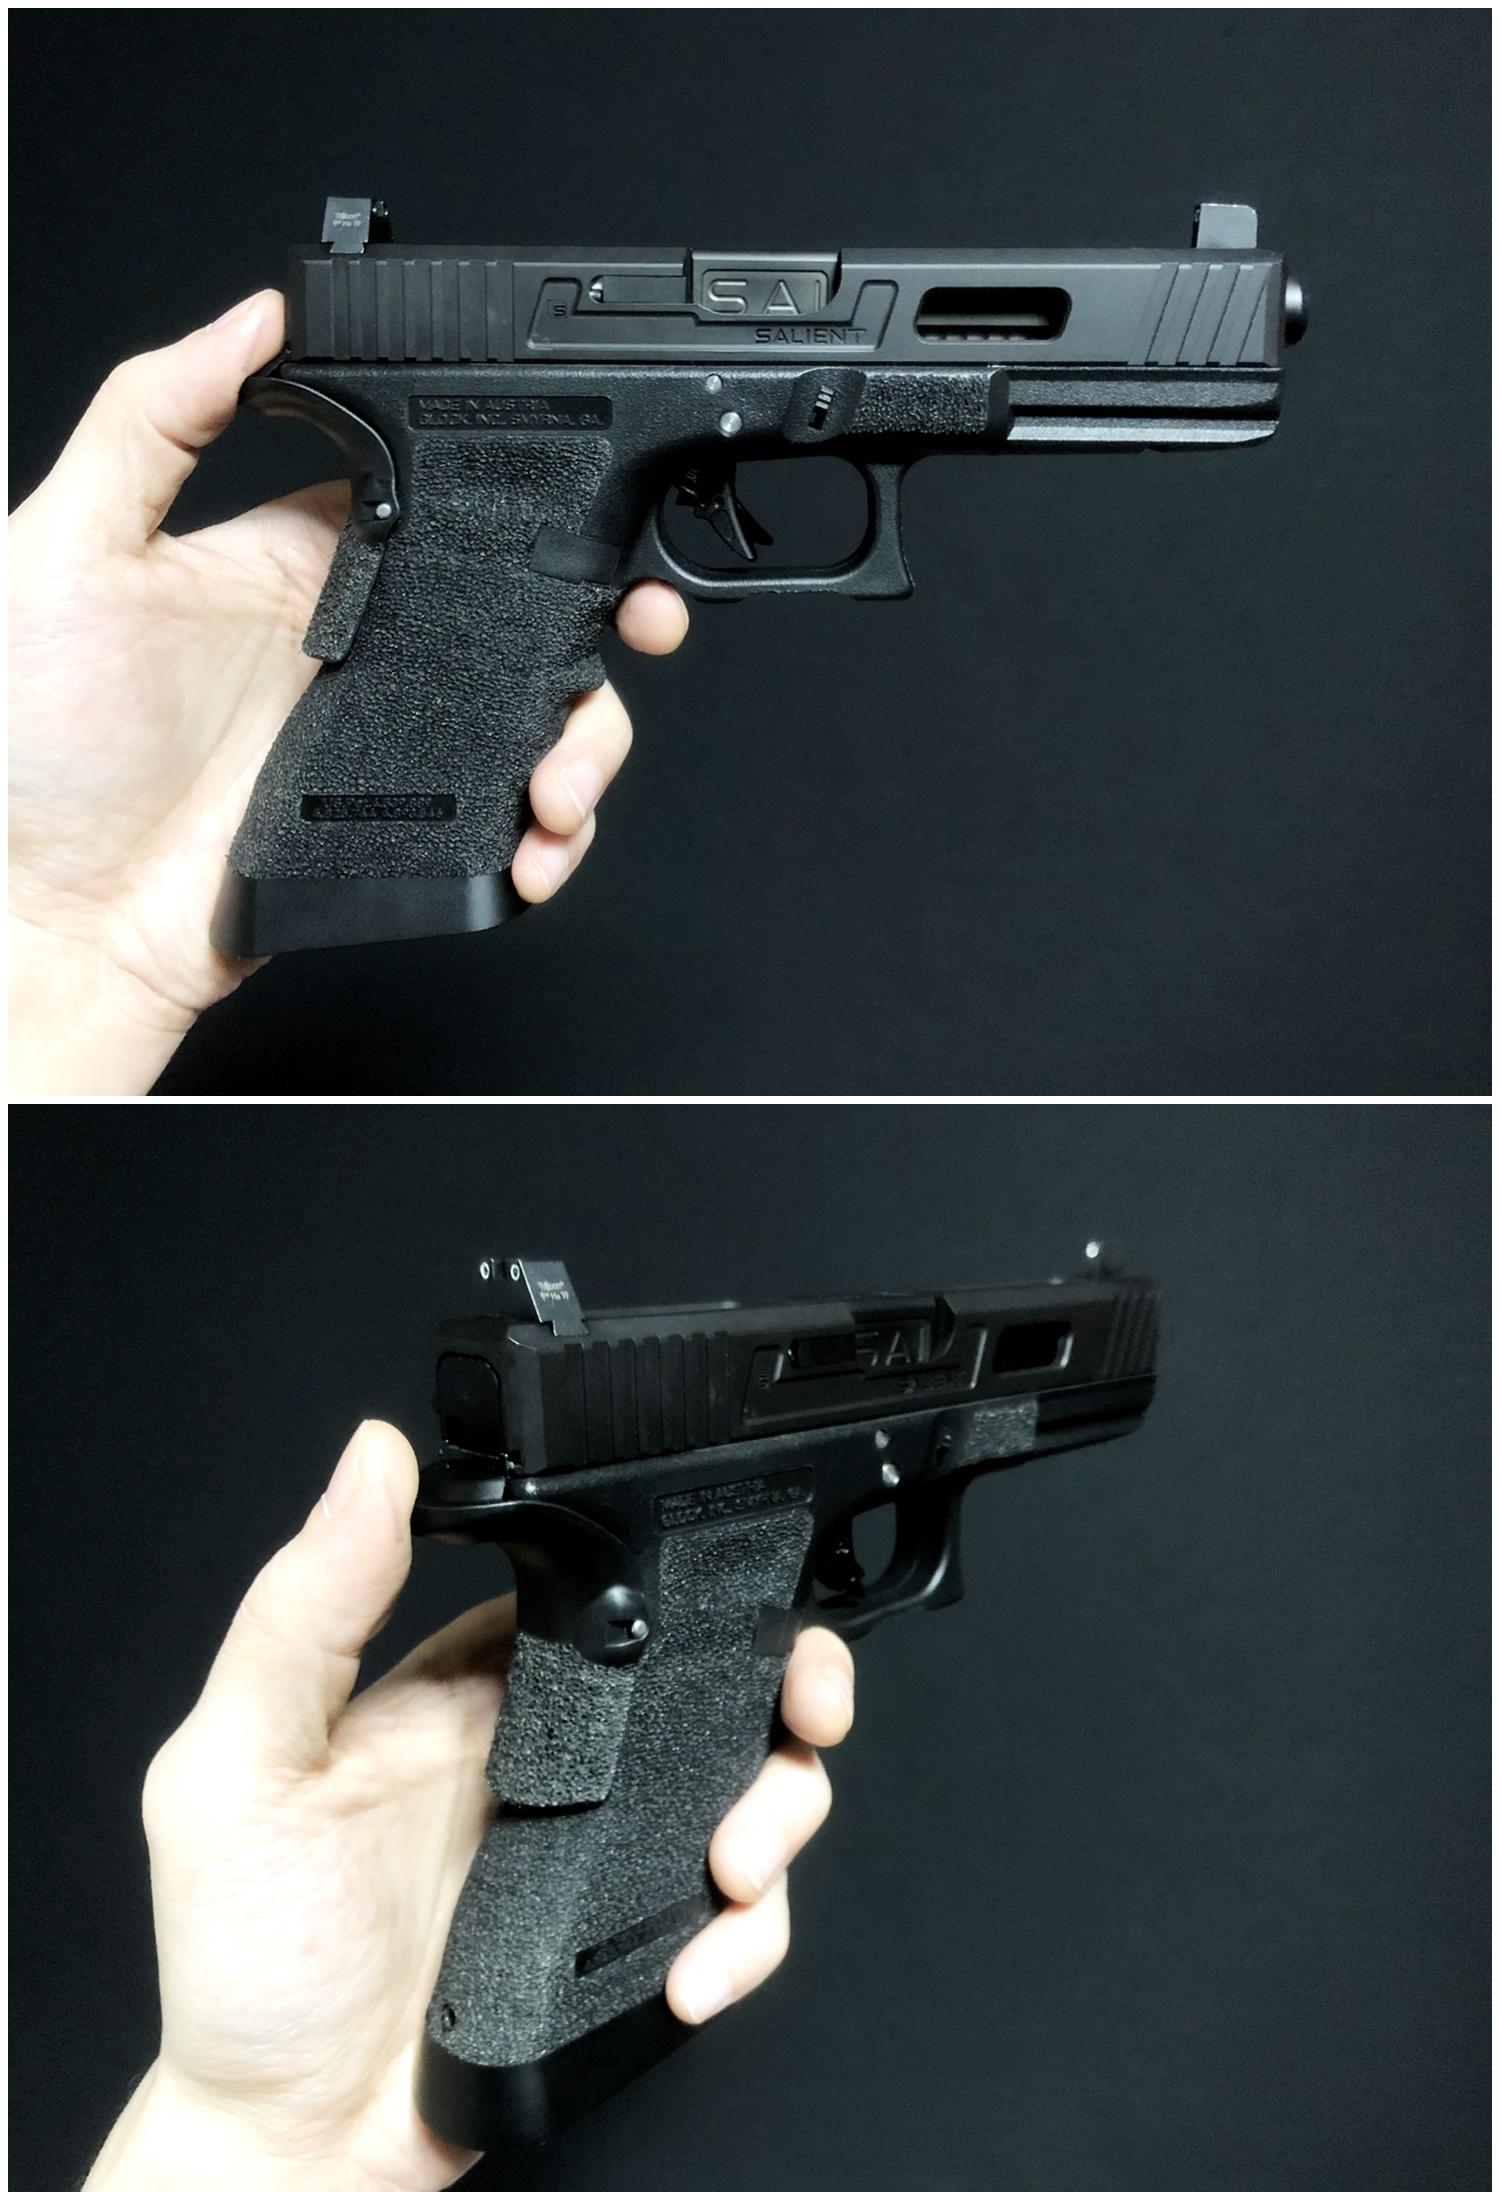 44 GLOCK Trijicon TRITIUM NIGHT SIGHTS HD HI LOW Guns Modify!! グロック トリジコン トリチウム サイト GET!! 購入 検証 取付 レビュー!! したるの巻!!